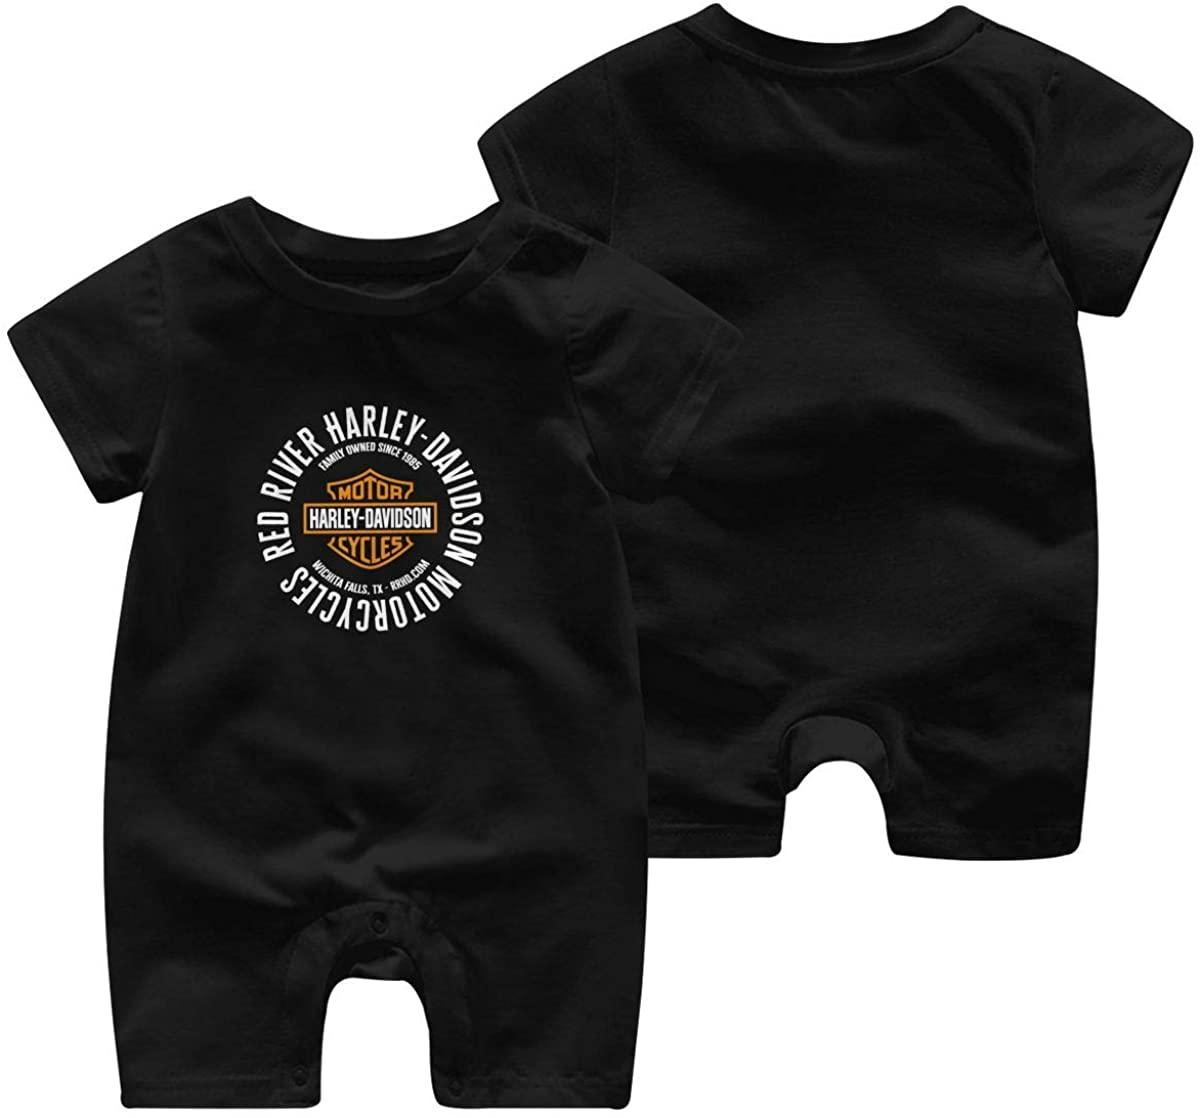 Harley Davidson Logo Baby Boys Girls Bodysuit Short Sleeve T Shirts Onesies Clothes